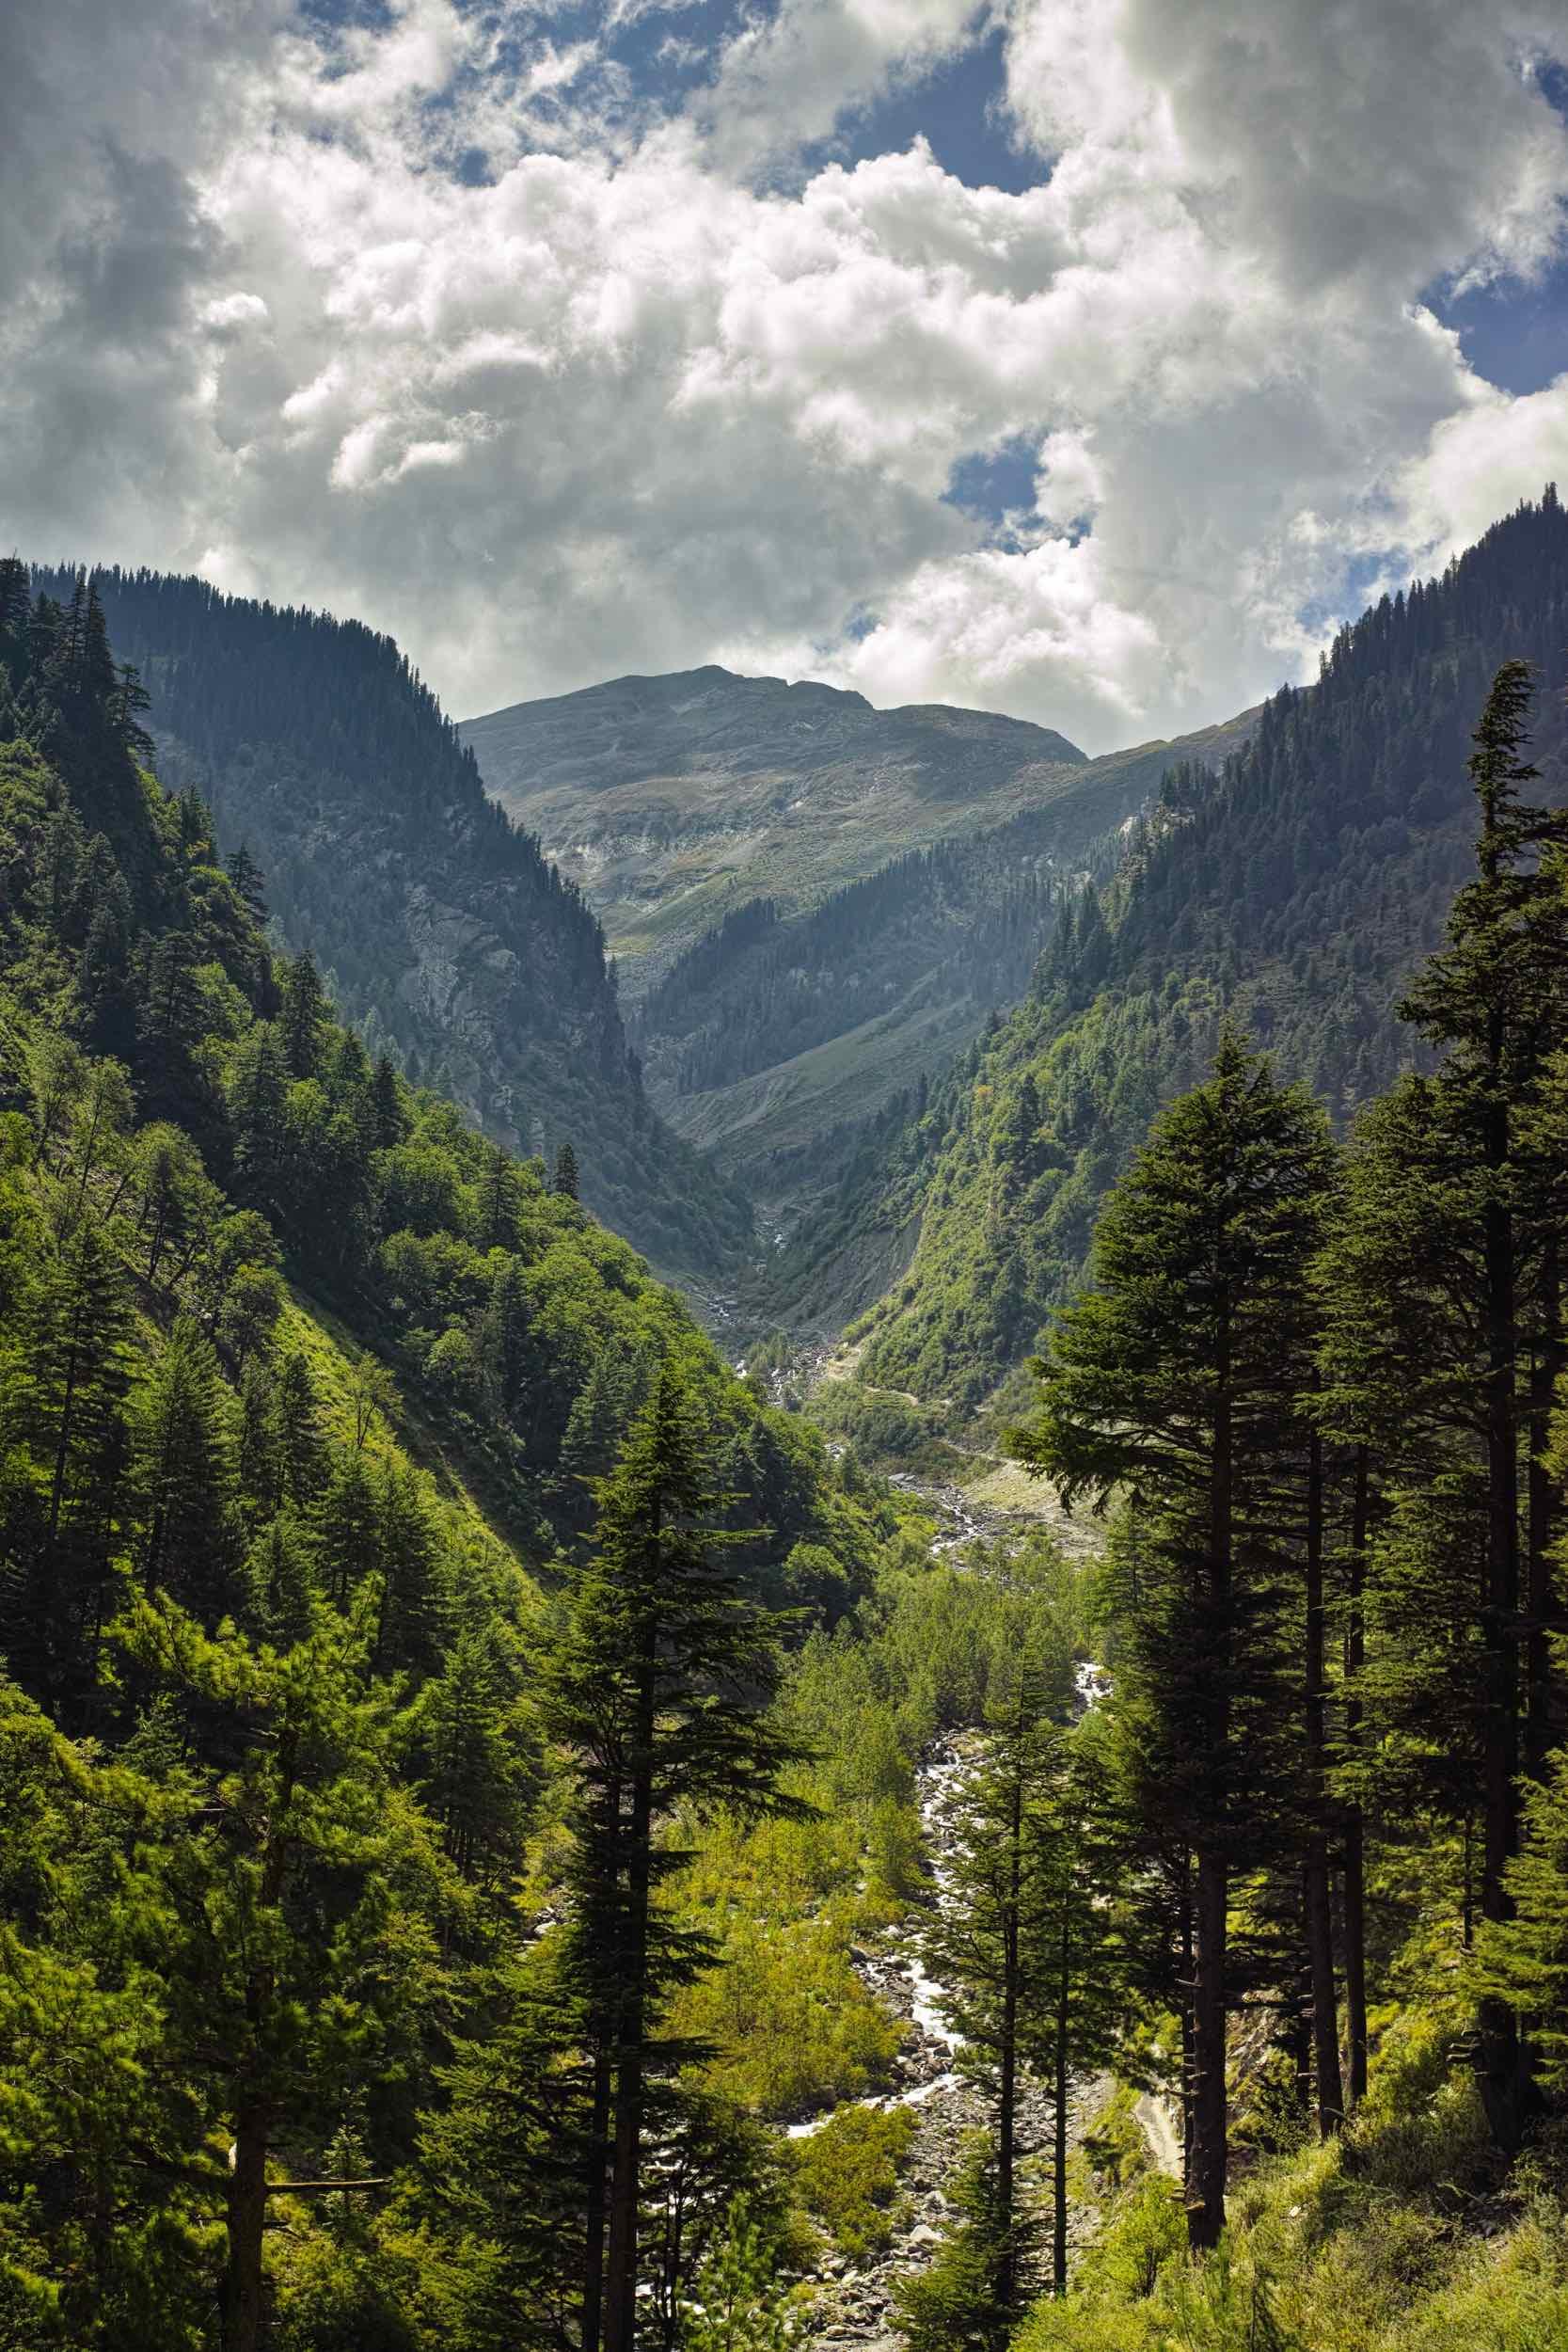 From Hadsar the trail follows the Mani Mahesh Stream